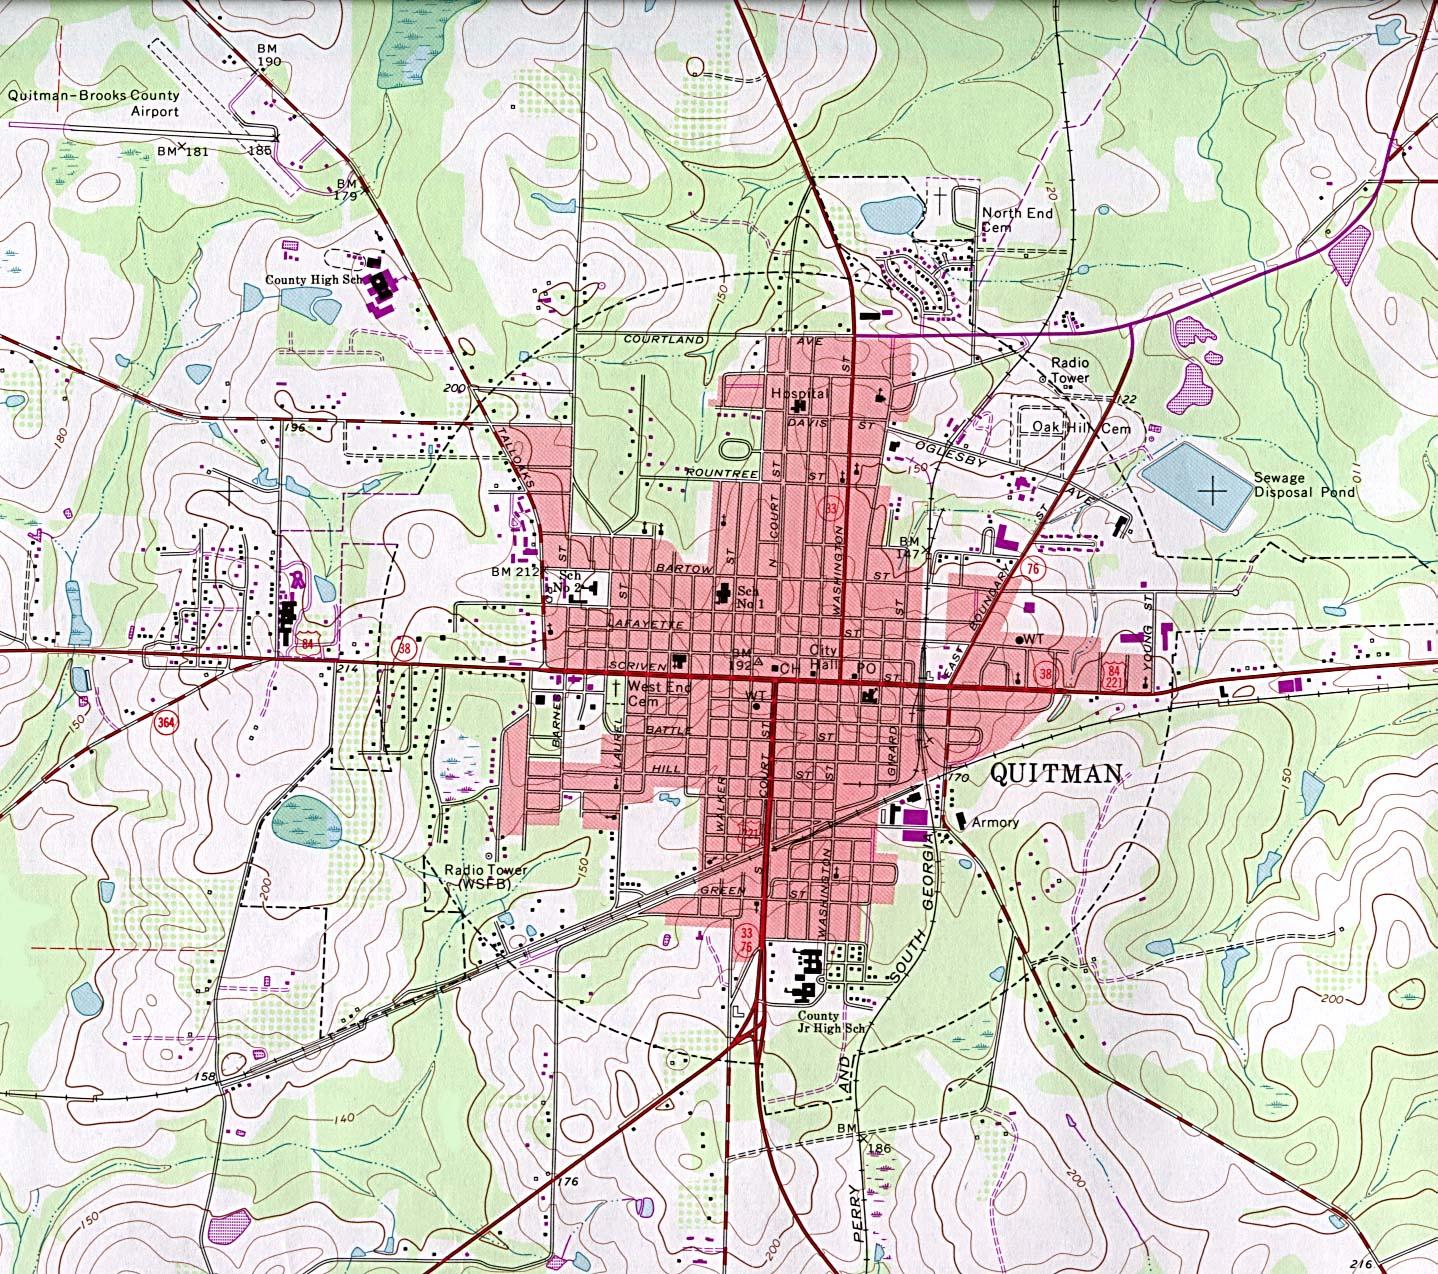 Quitman Topographic City Map, Georgia, United States